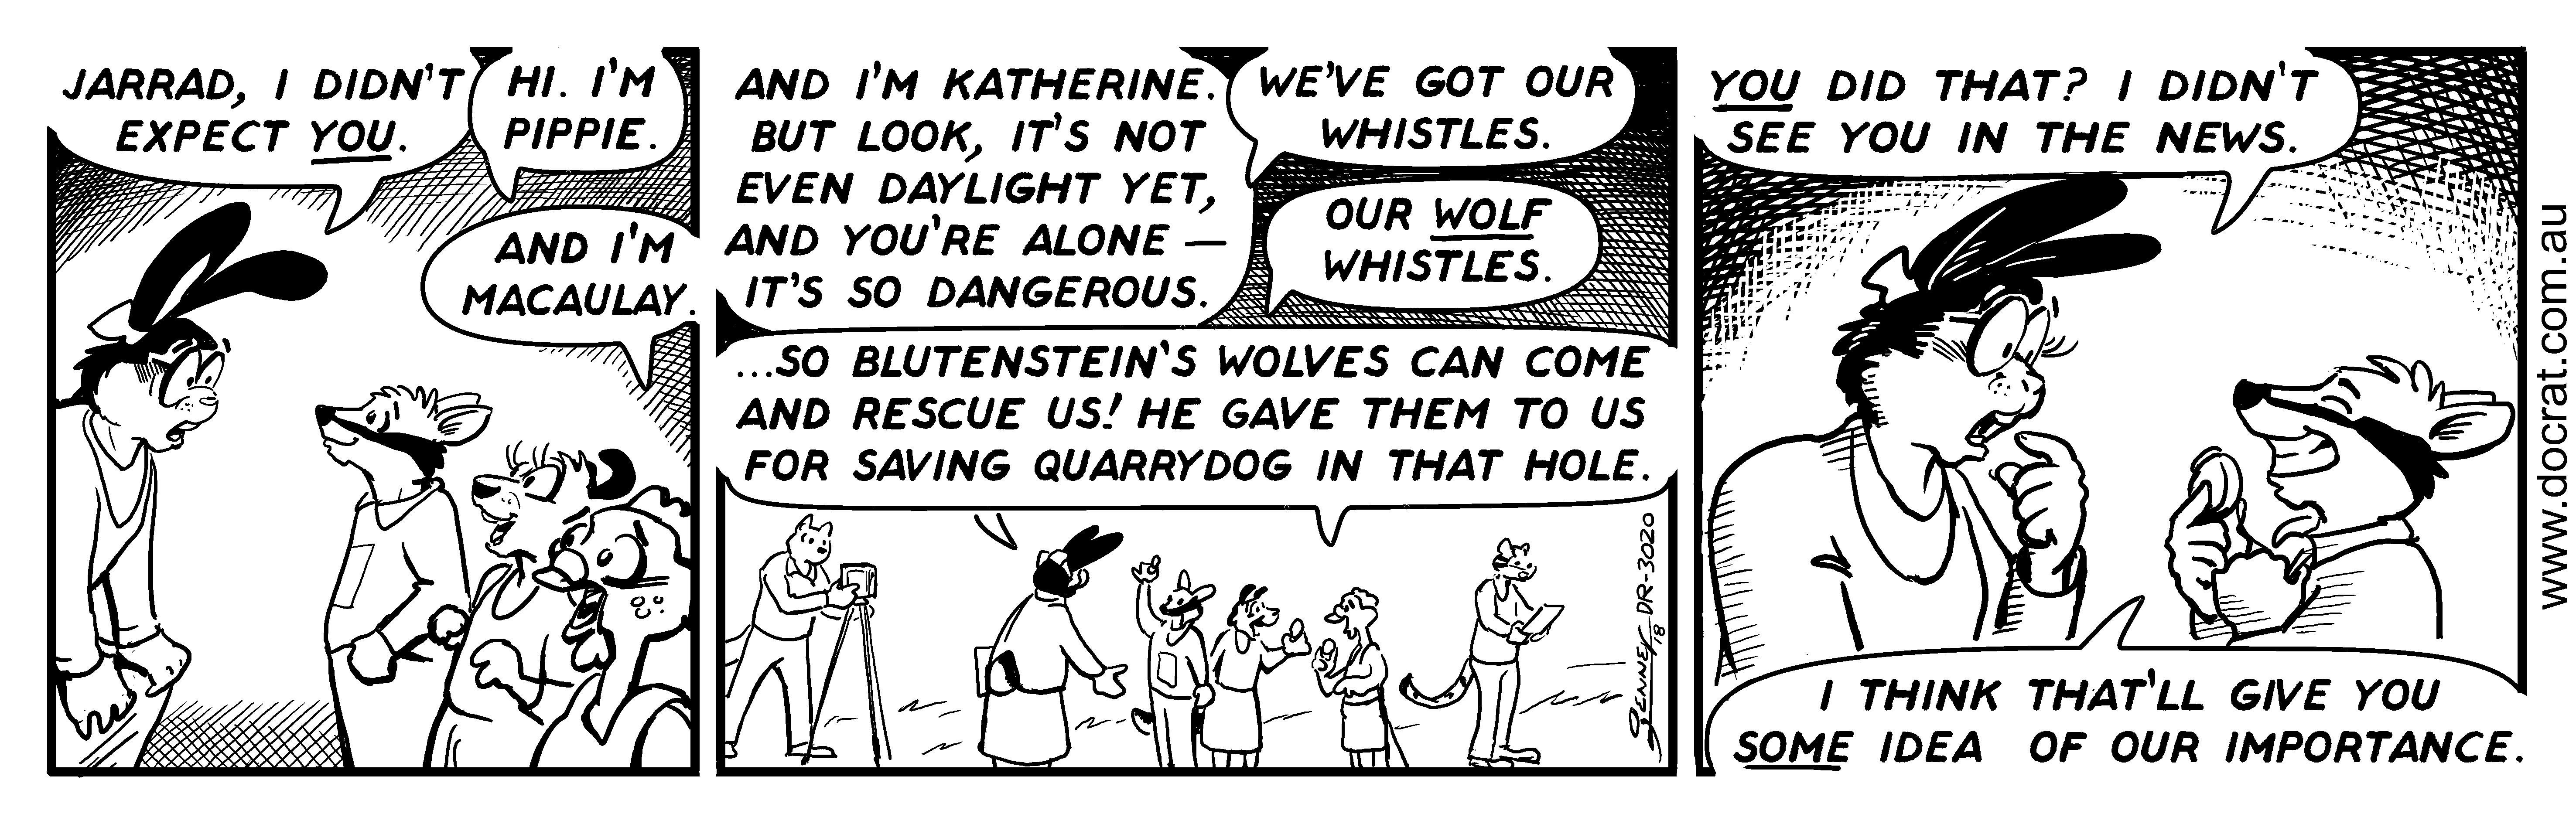 20180511